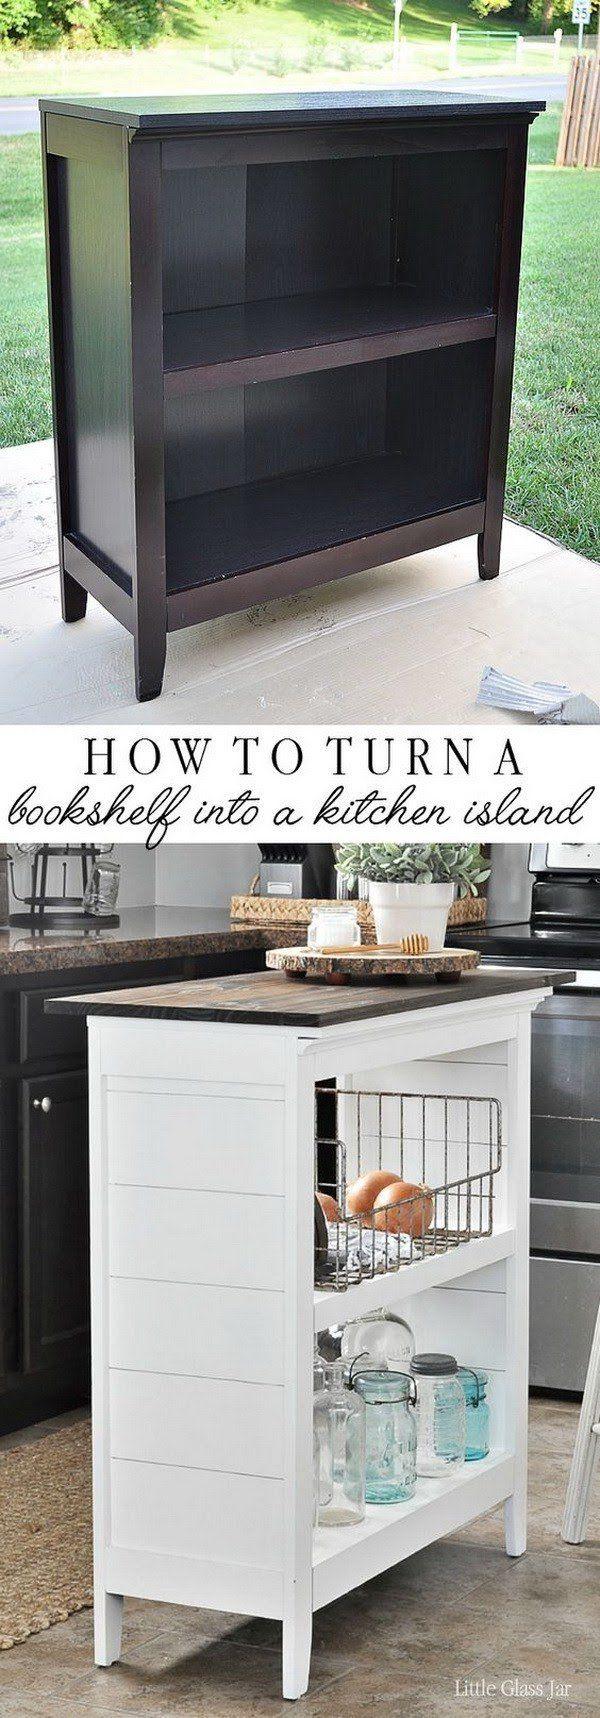 diy bookshelf kitchen island. | furniture make-overs | pinterest